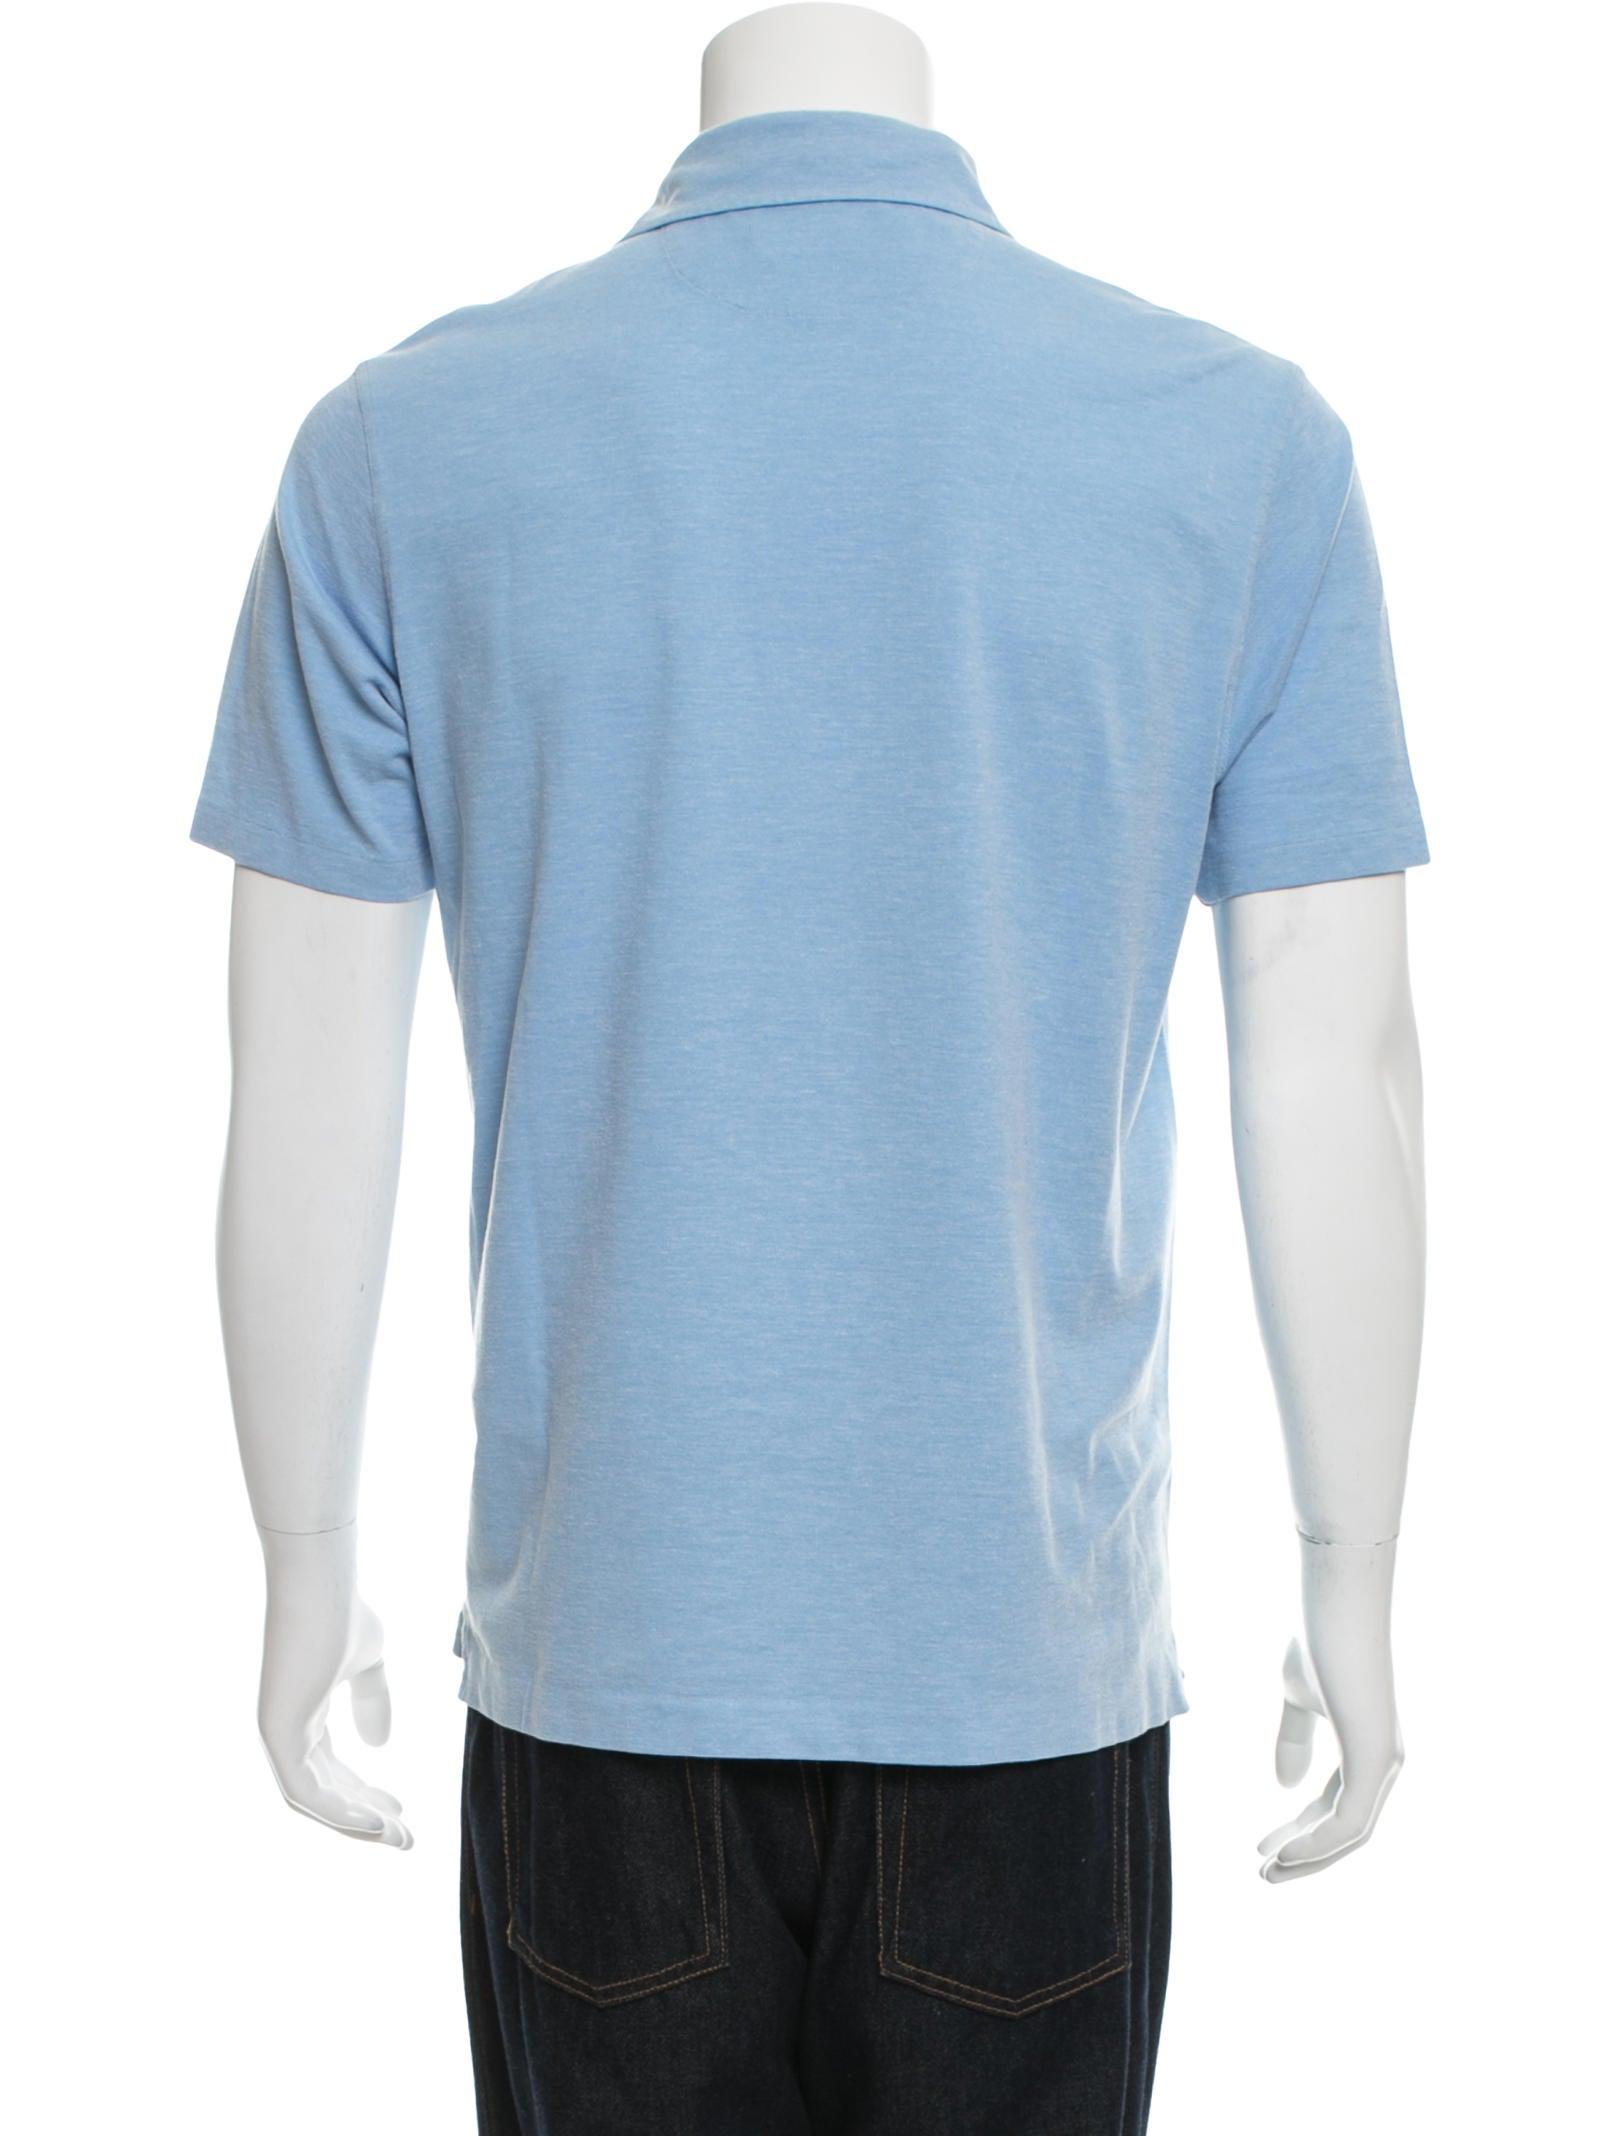 Ermenegildo zegna short sleeve polo shirt clothing for Zegna polo shirts sale